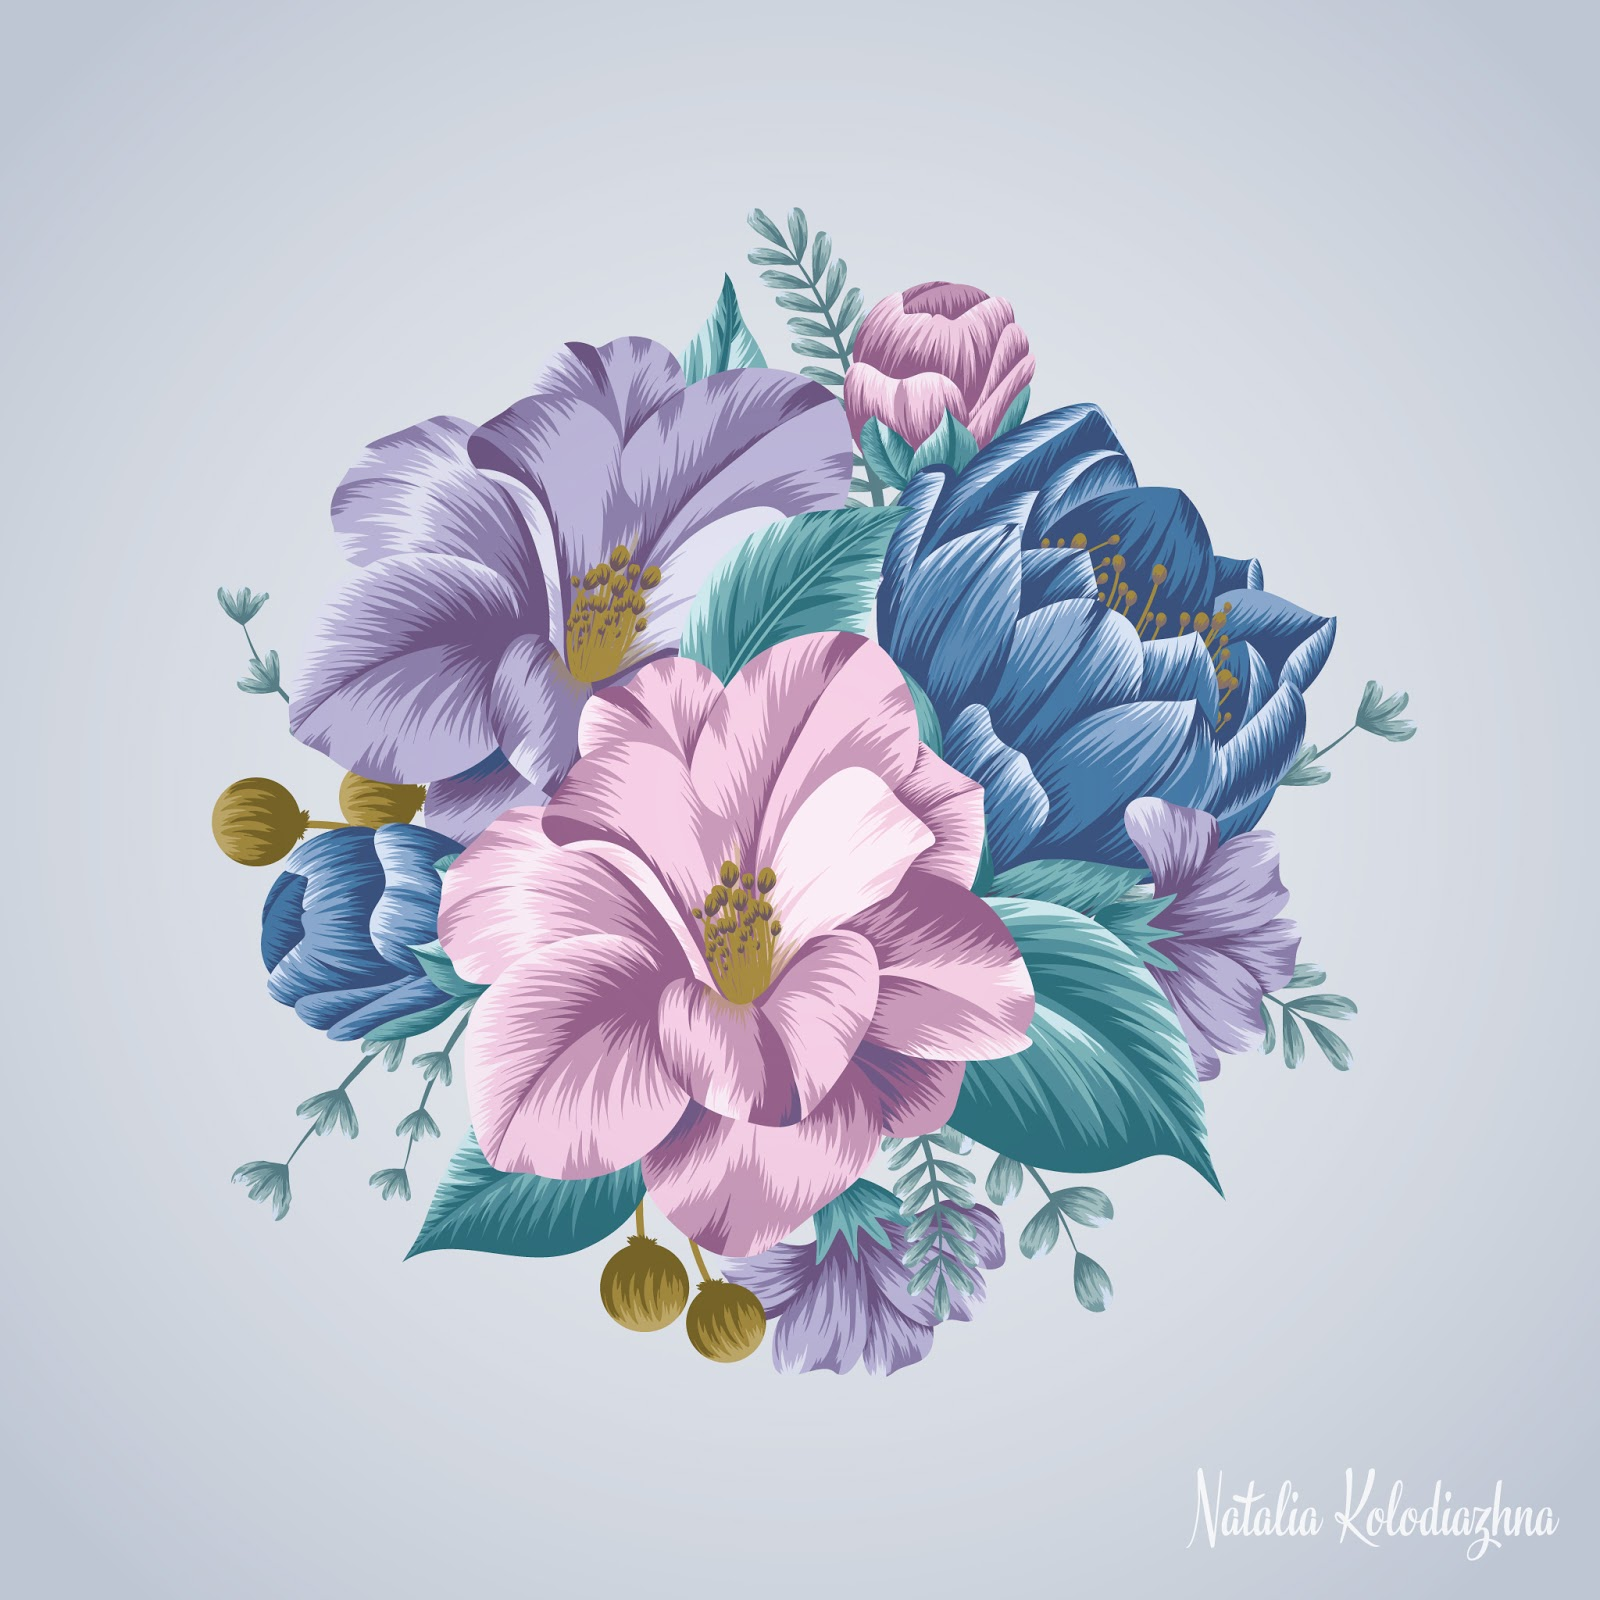 Floral camellia motif by Natalia Kolodiazhna